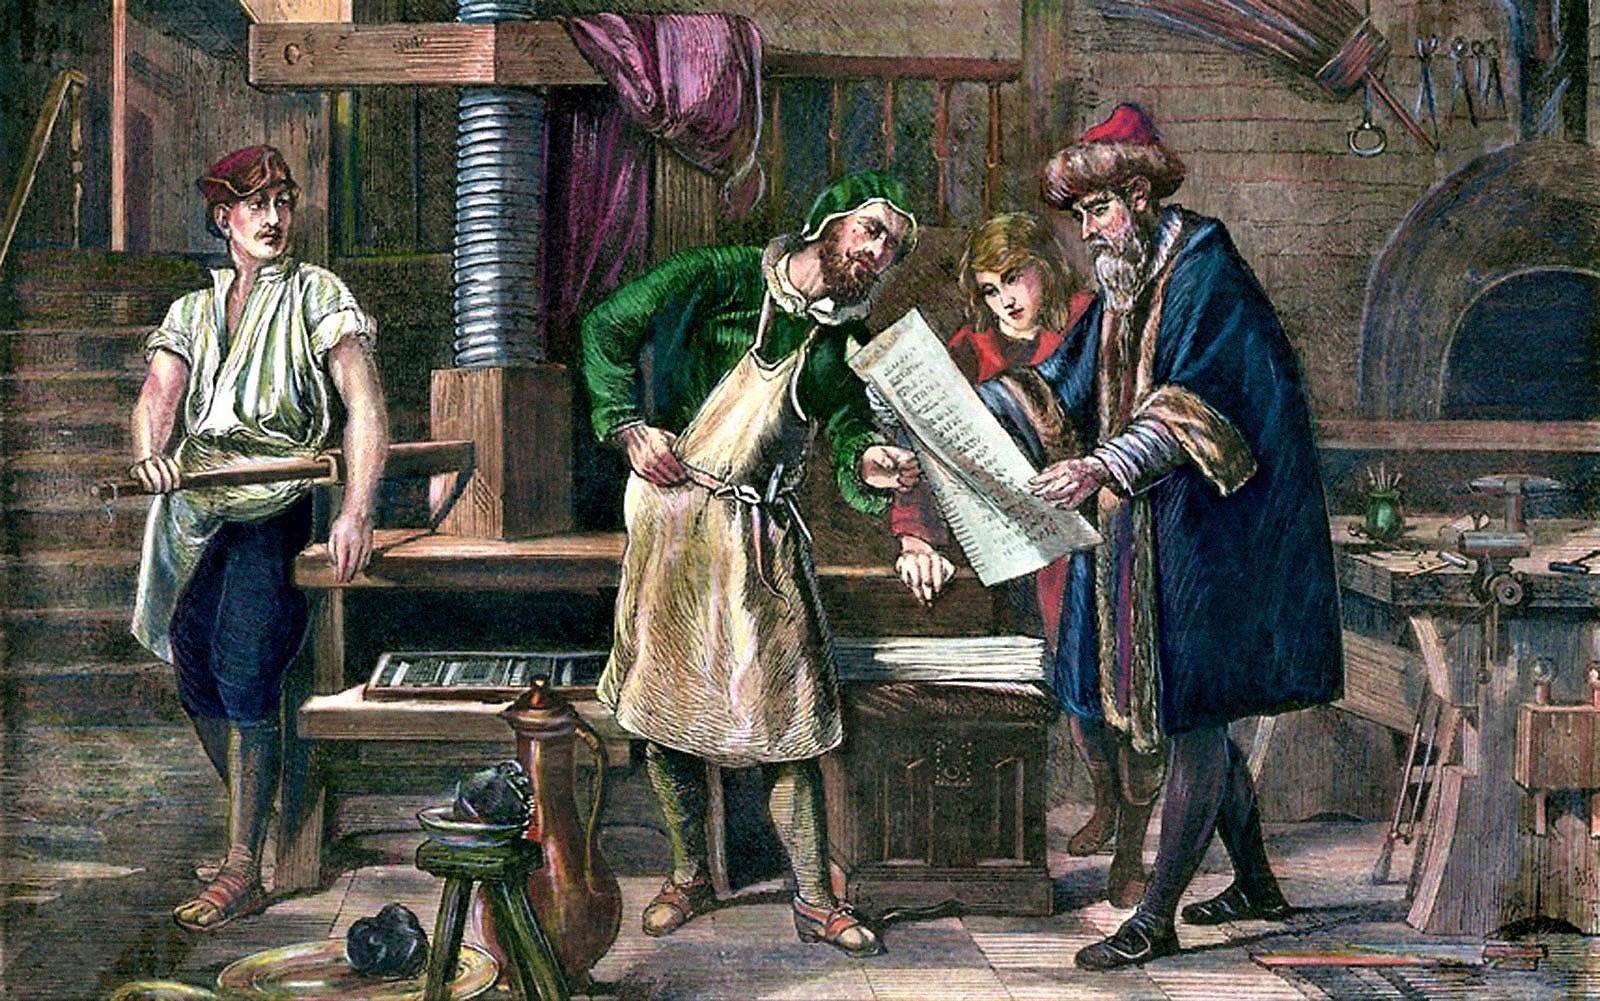 Johannes Gutenberg made billboards possible